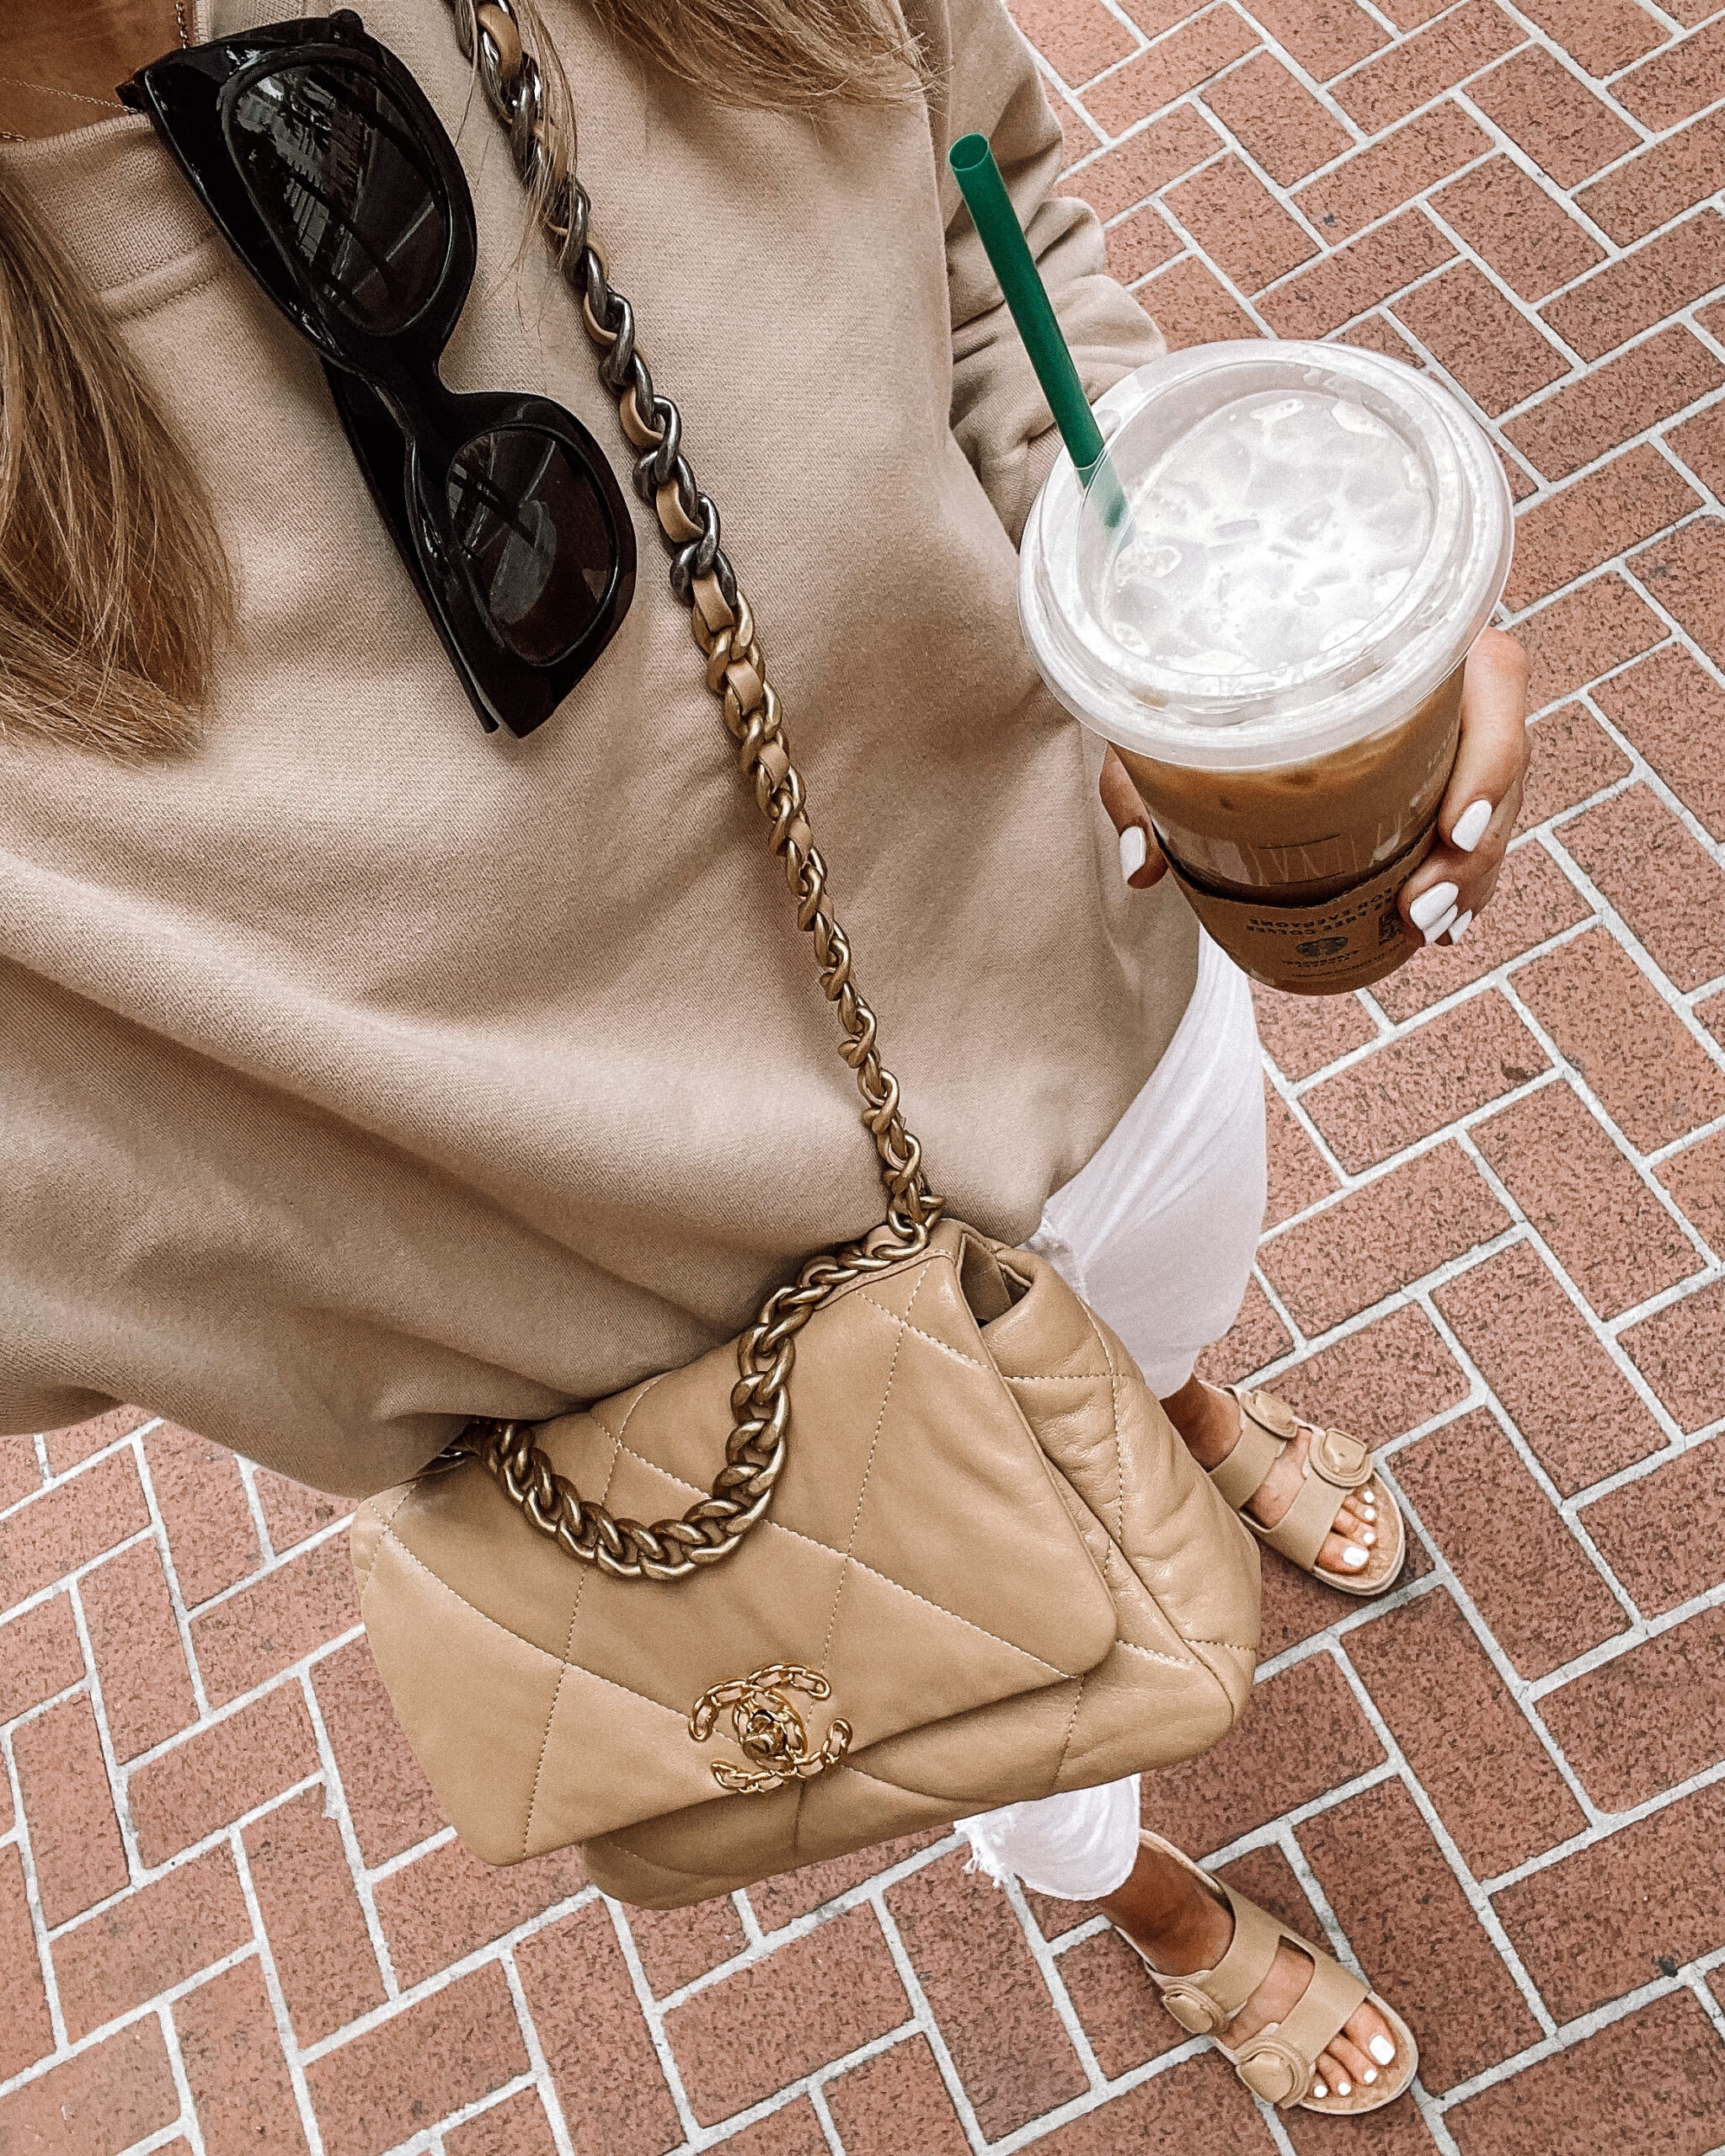 Fashion Jackson Wearing Tan Sweatshirt White Jeans Tan Slide Sandals Tan Chanel Handbag